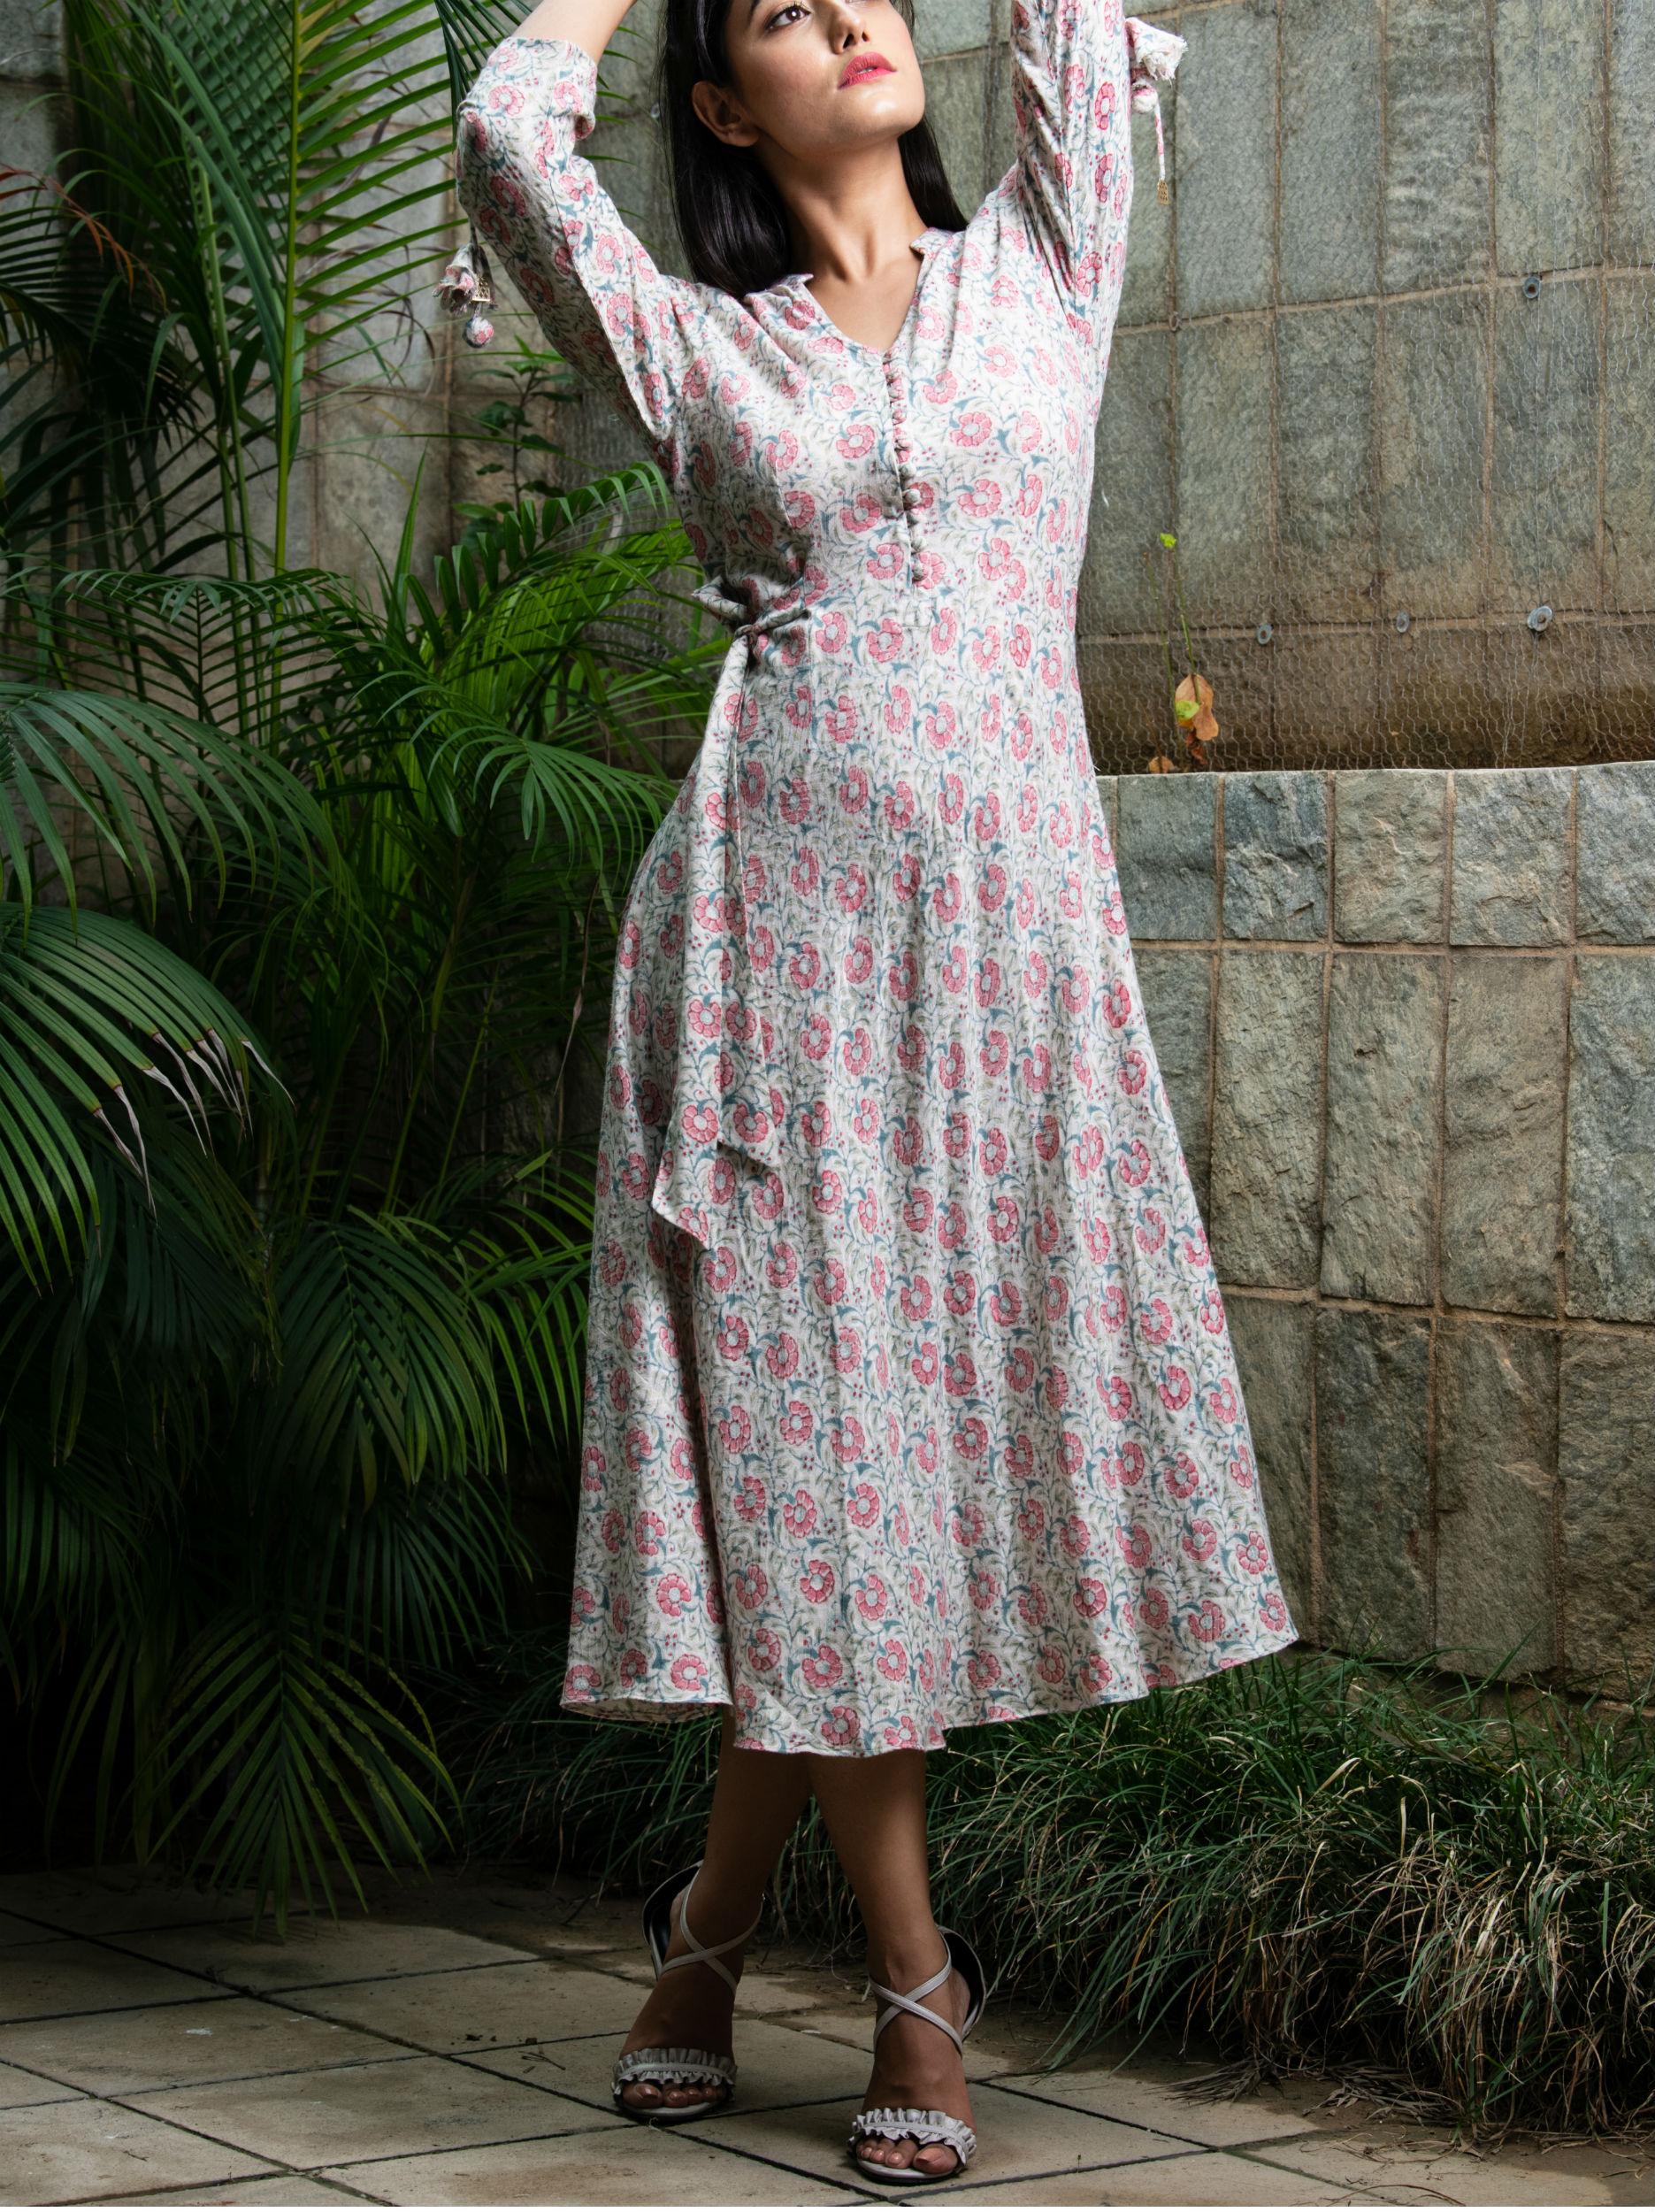 Cream swing dress